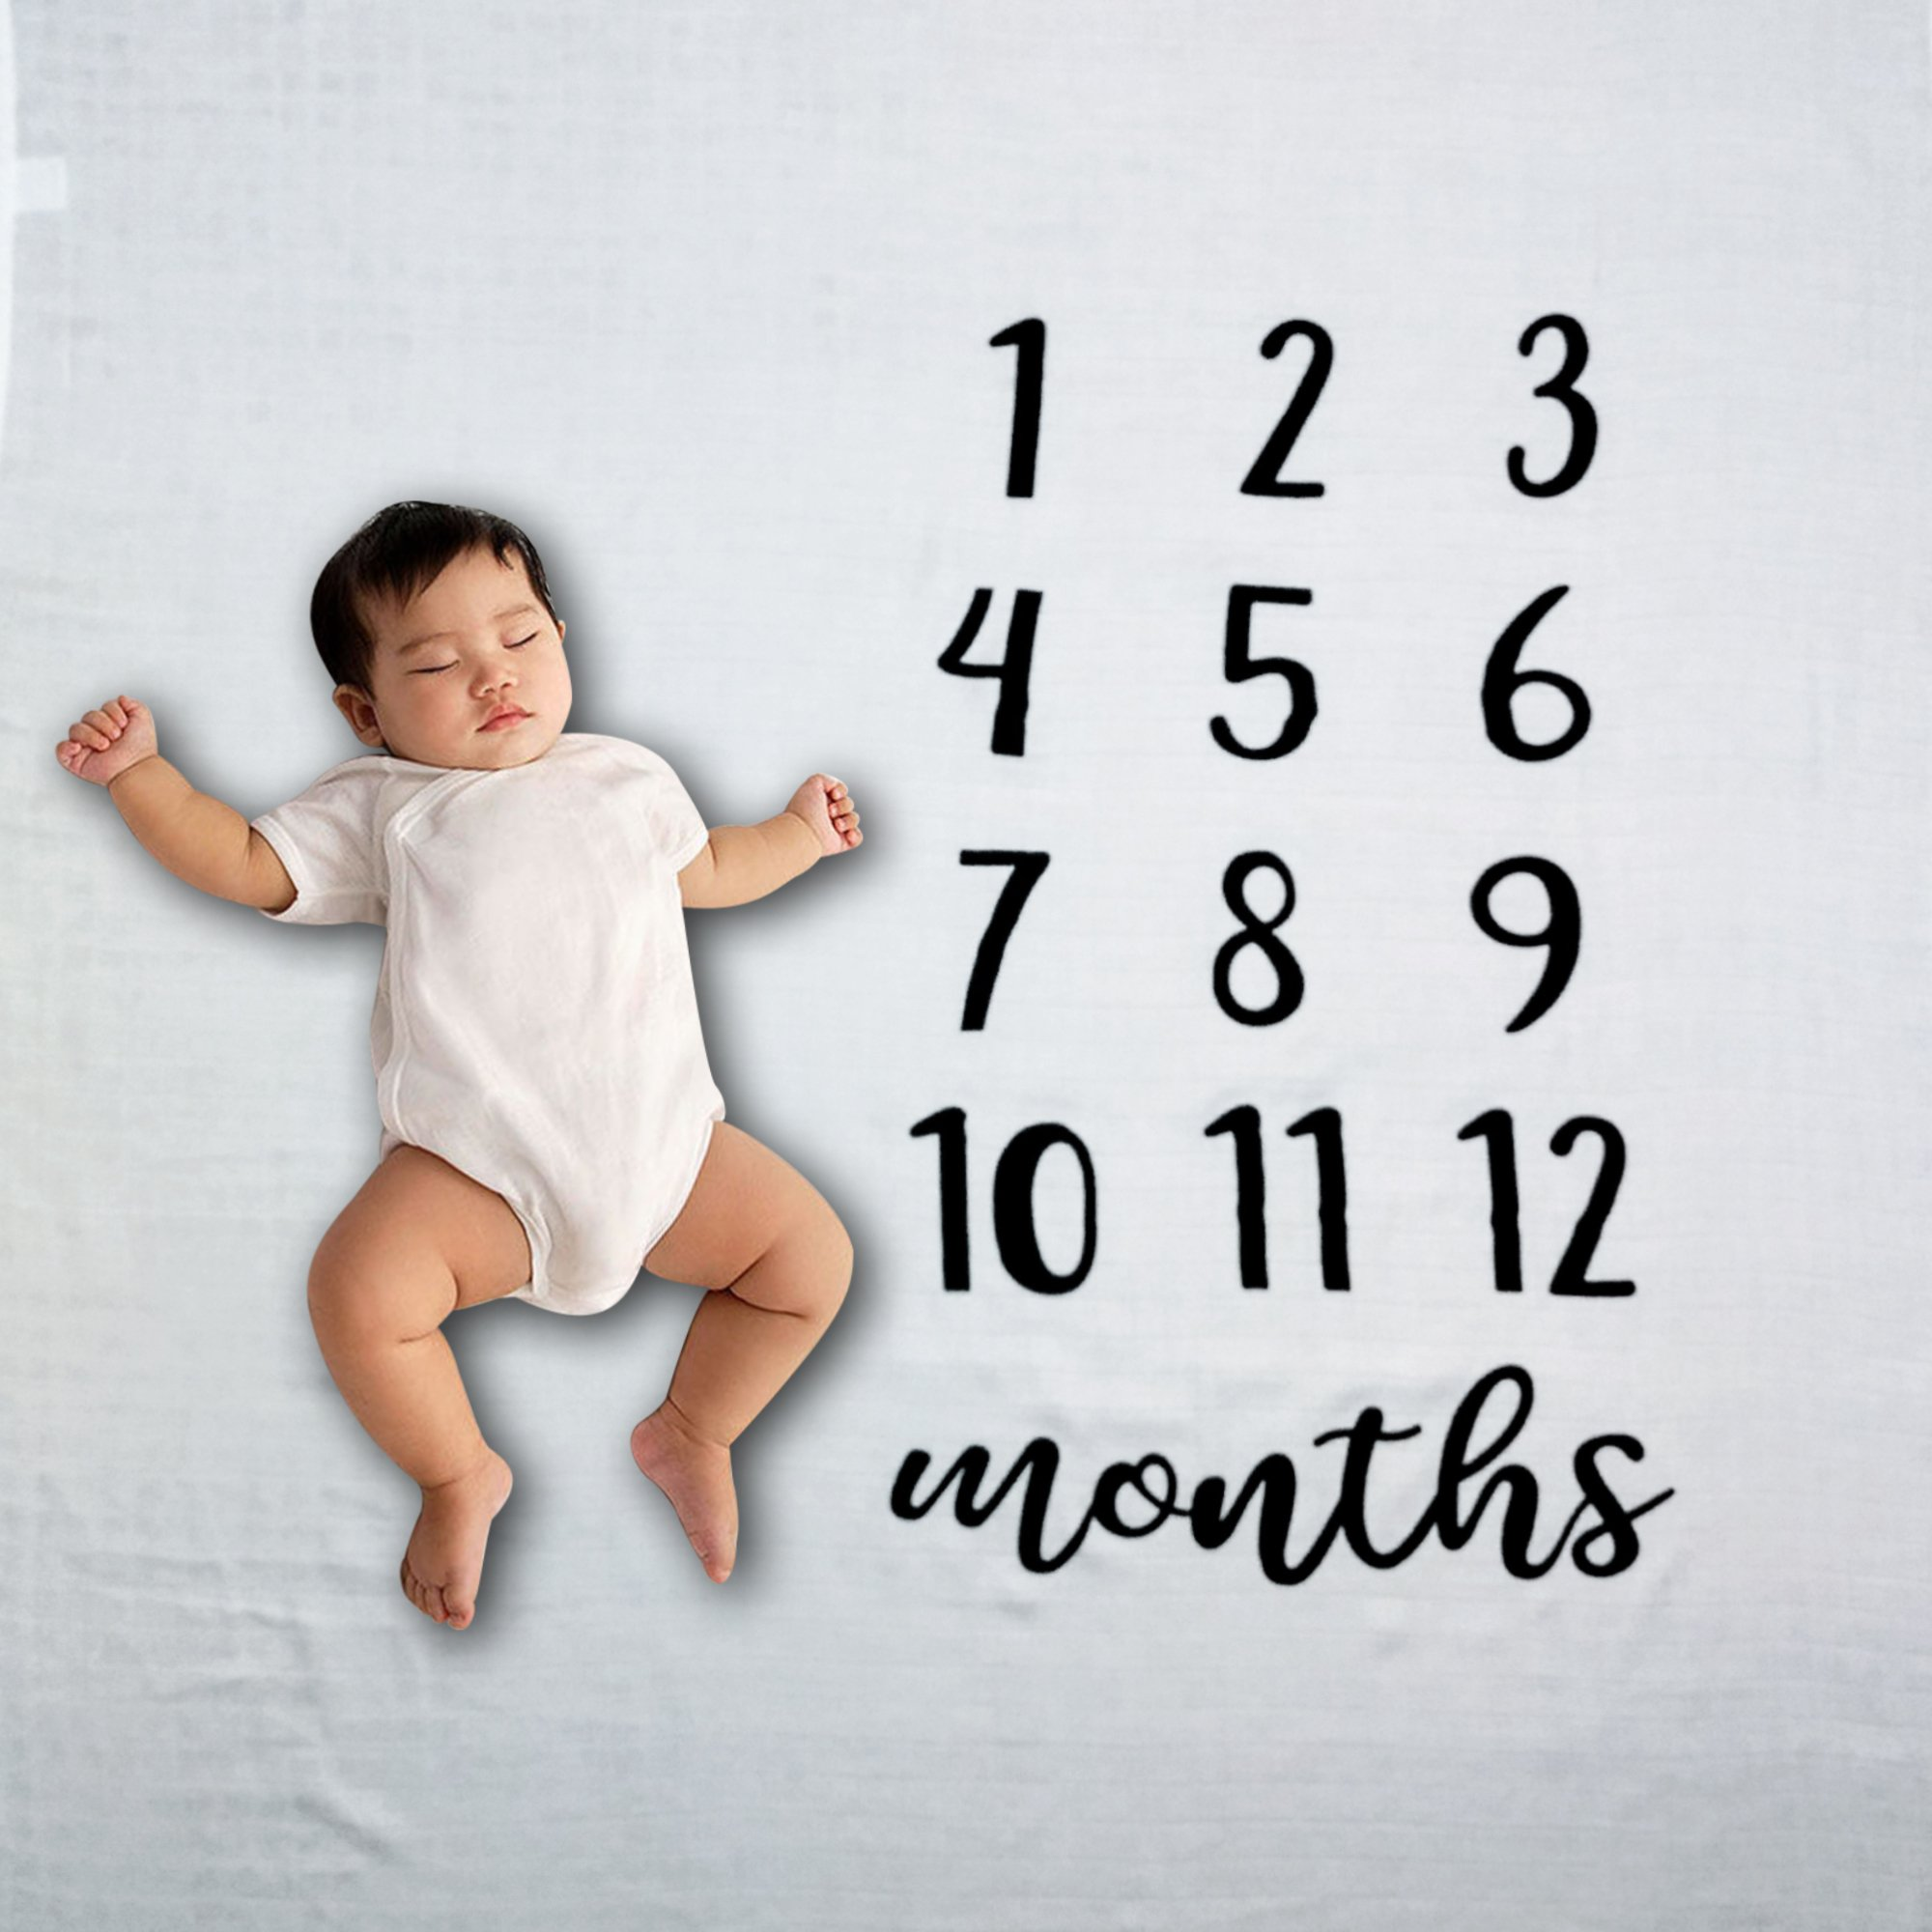 Baby Blanket- Baby Milestone Blanket- Newborn Milestone Bamboo Blanket- Soft and Warm Baby Blanket- Monthly 47'' x 47'' Blanket for Newborns- Perfect Baby Shower Gift